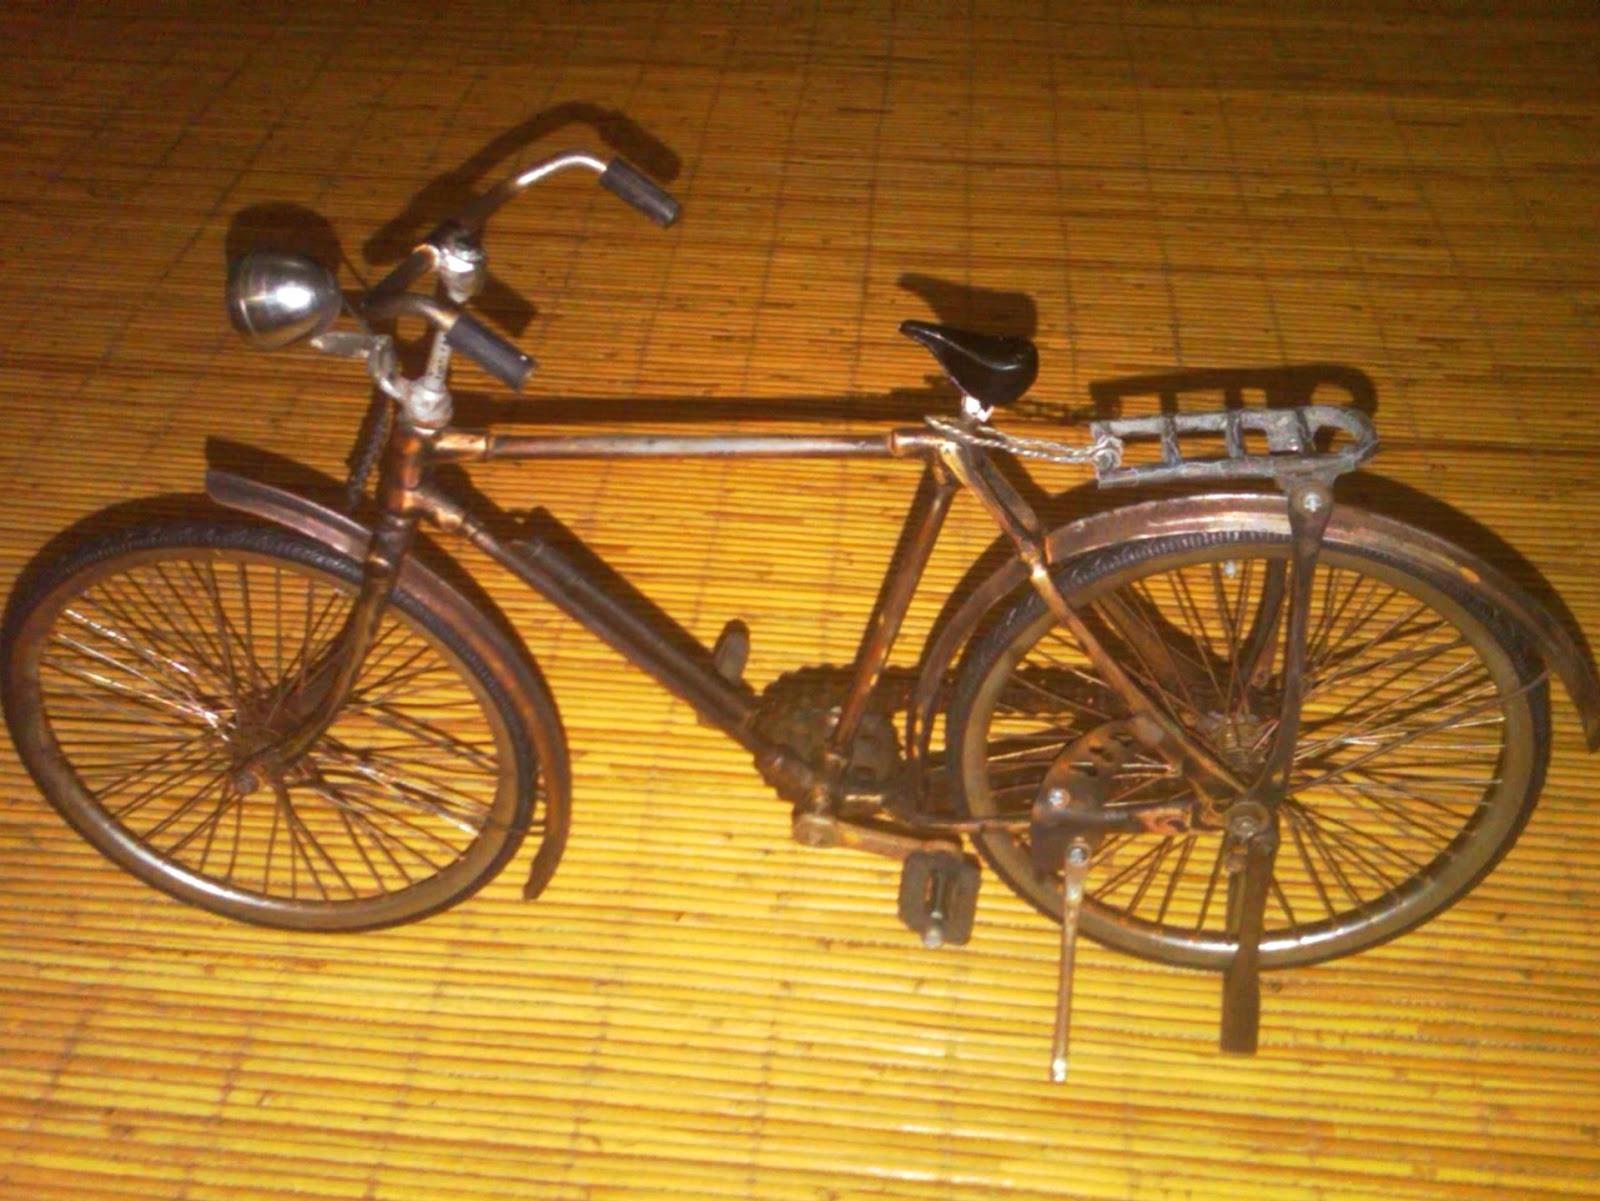 Toko Barang Bekasku Miniatur Sepeda Ontel Antik